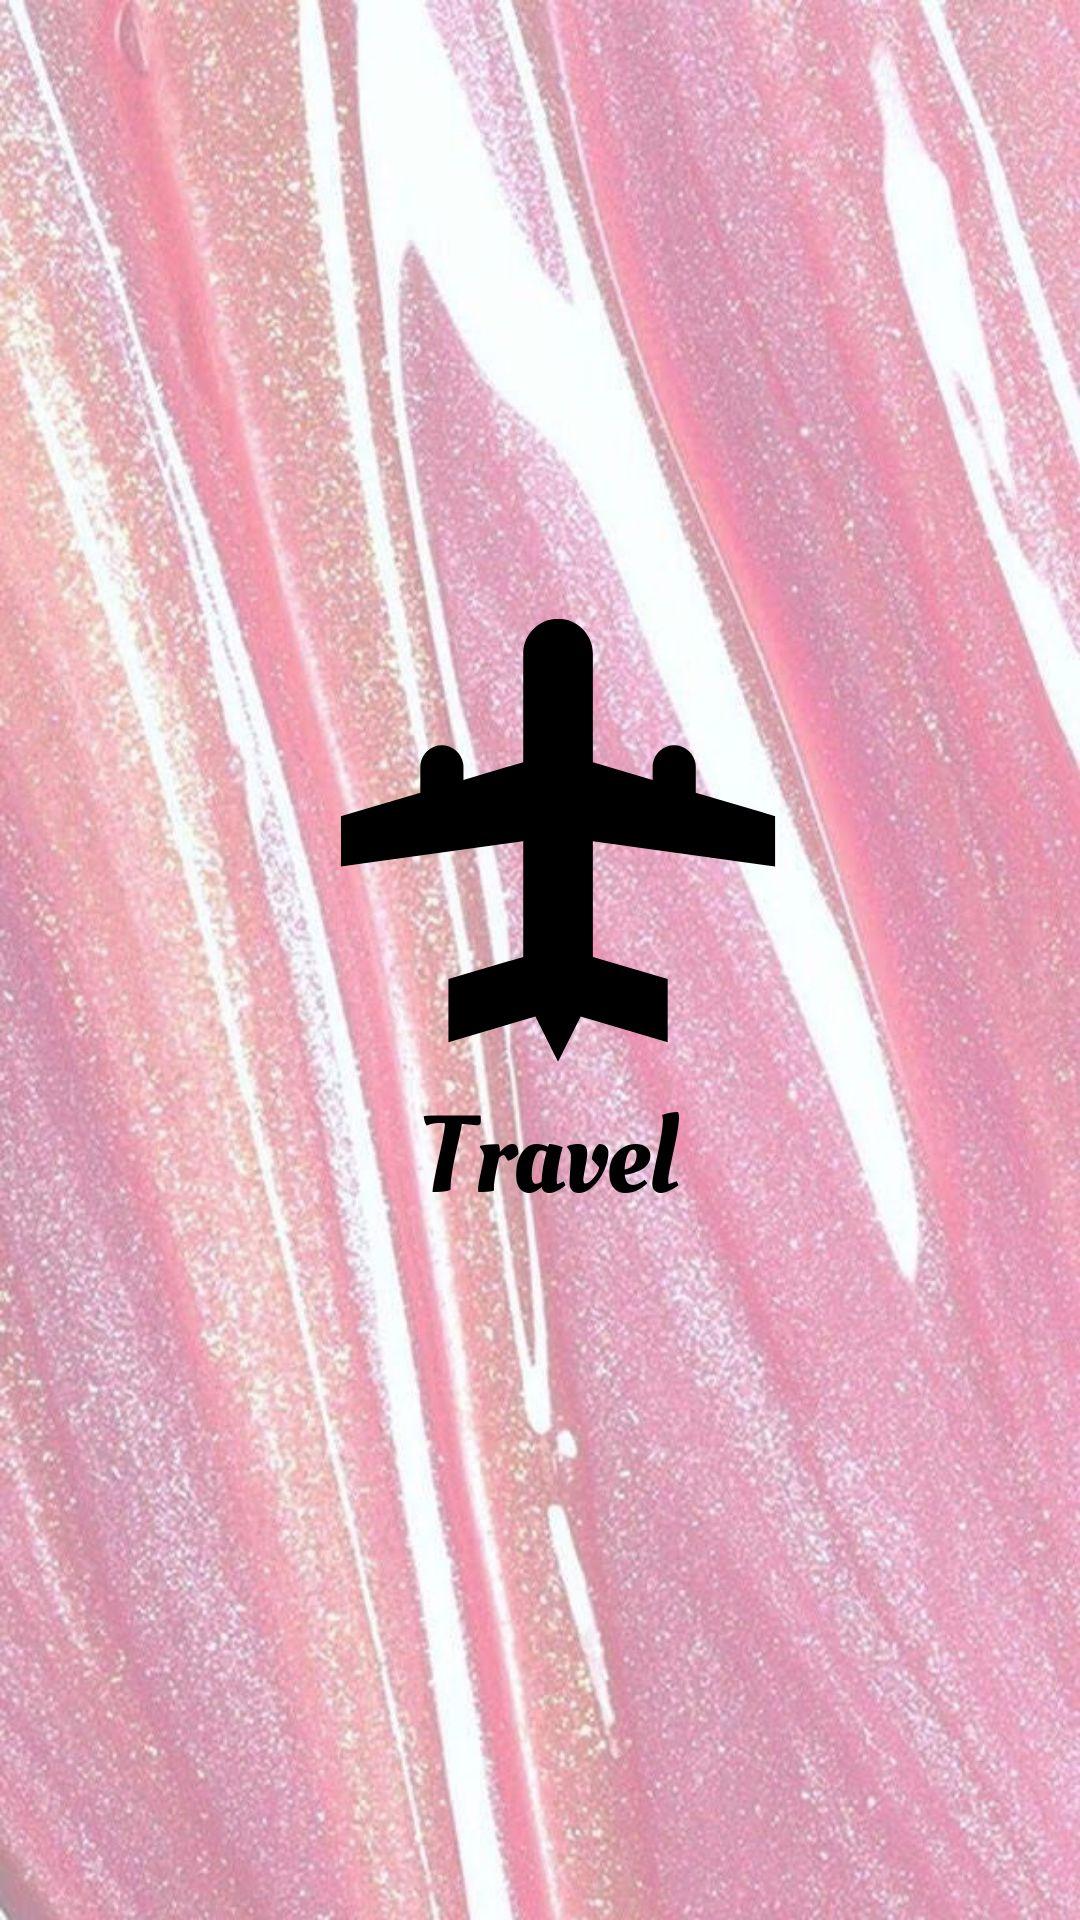 Background Instagram Travel Traveling Airplane World Pink